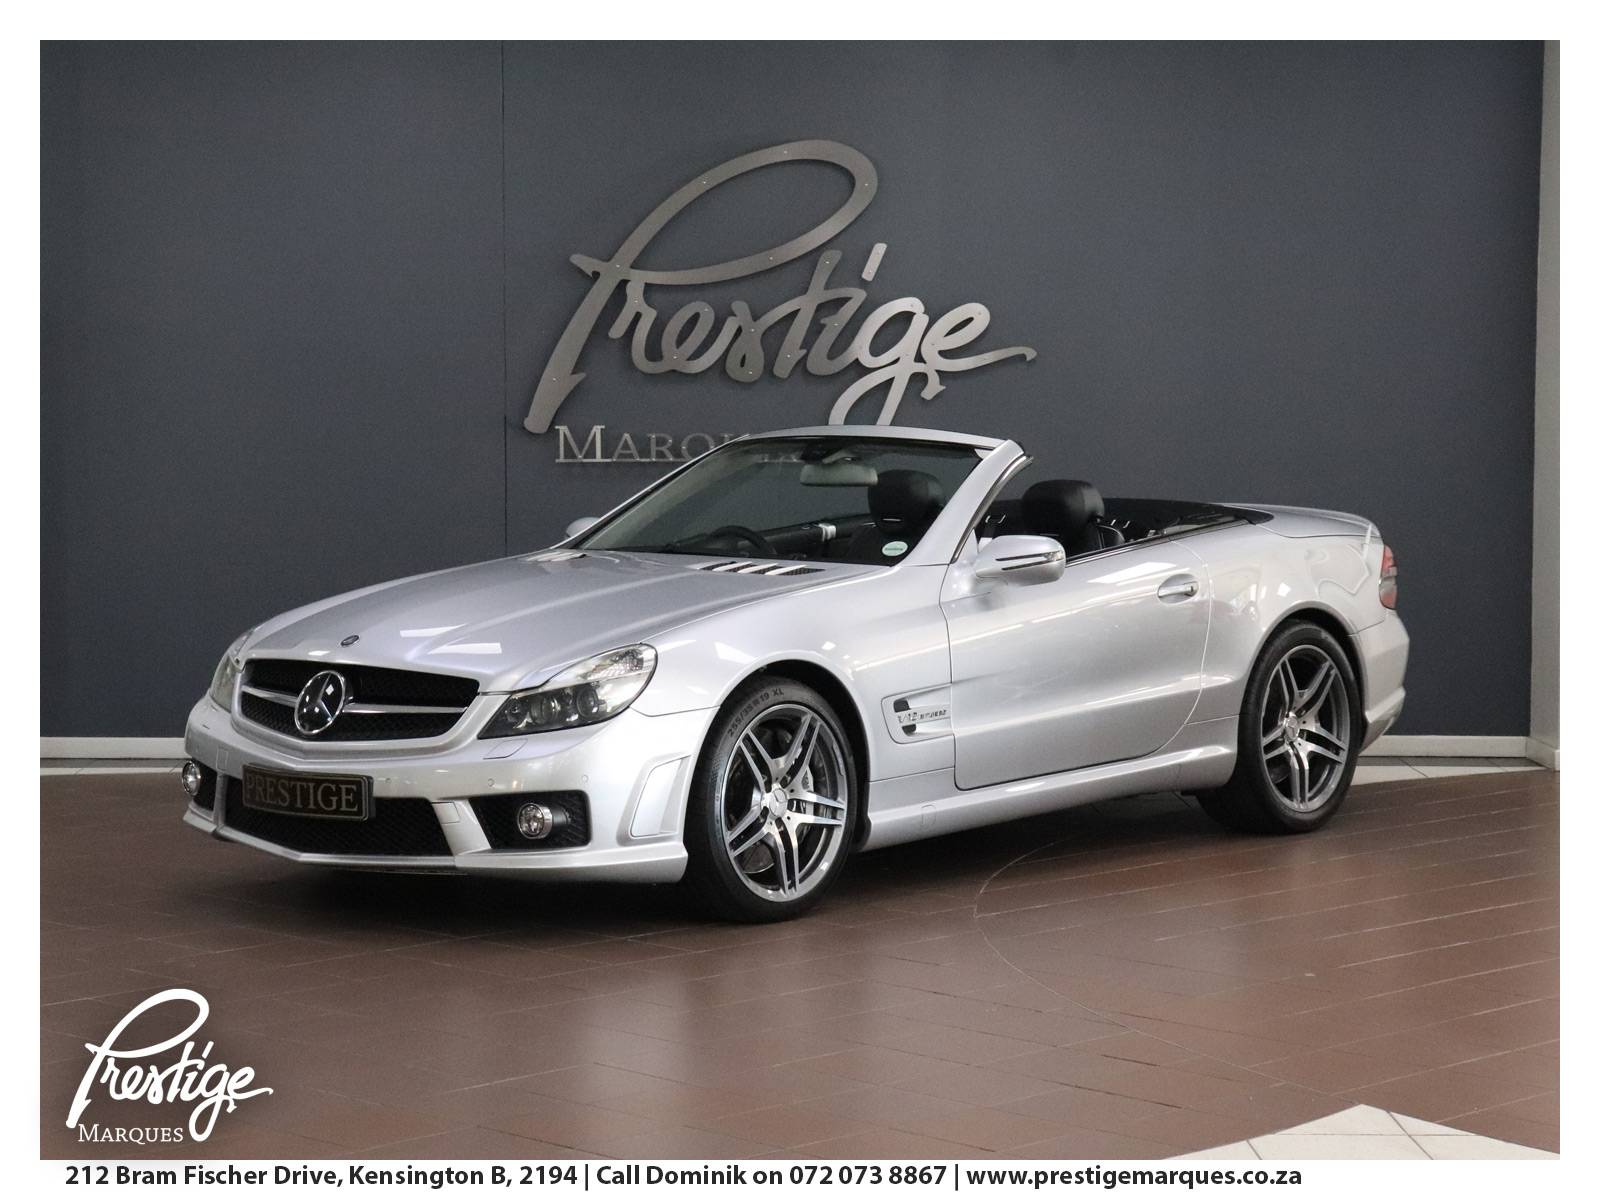 2008-Mercedes Benz-SL Cab-Silver-Prestige-Marques-Randburg-Sandton-14